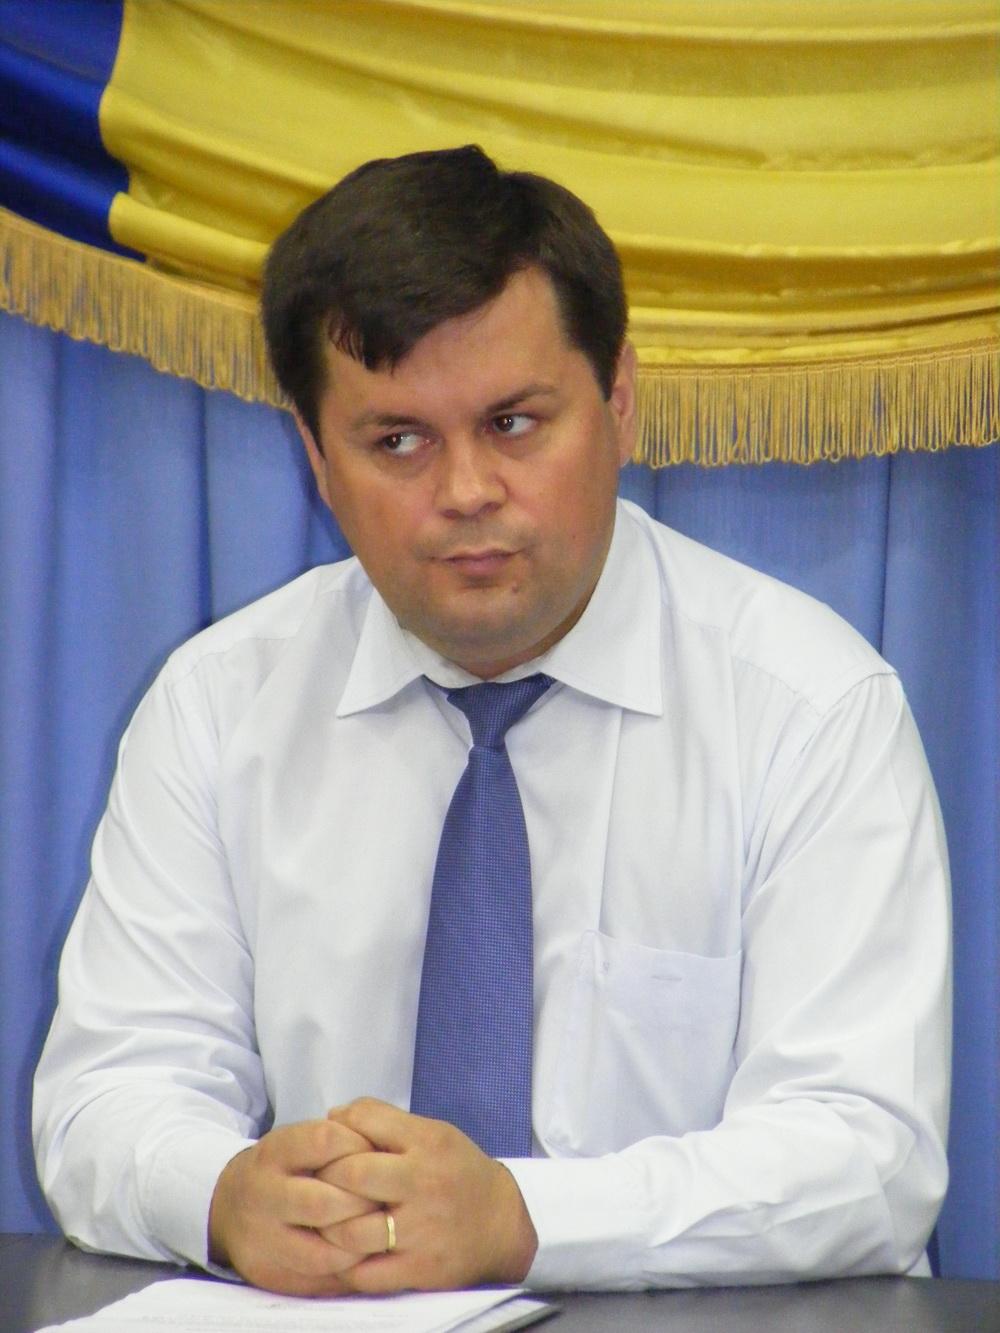 marcel romanescu